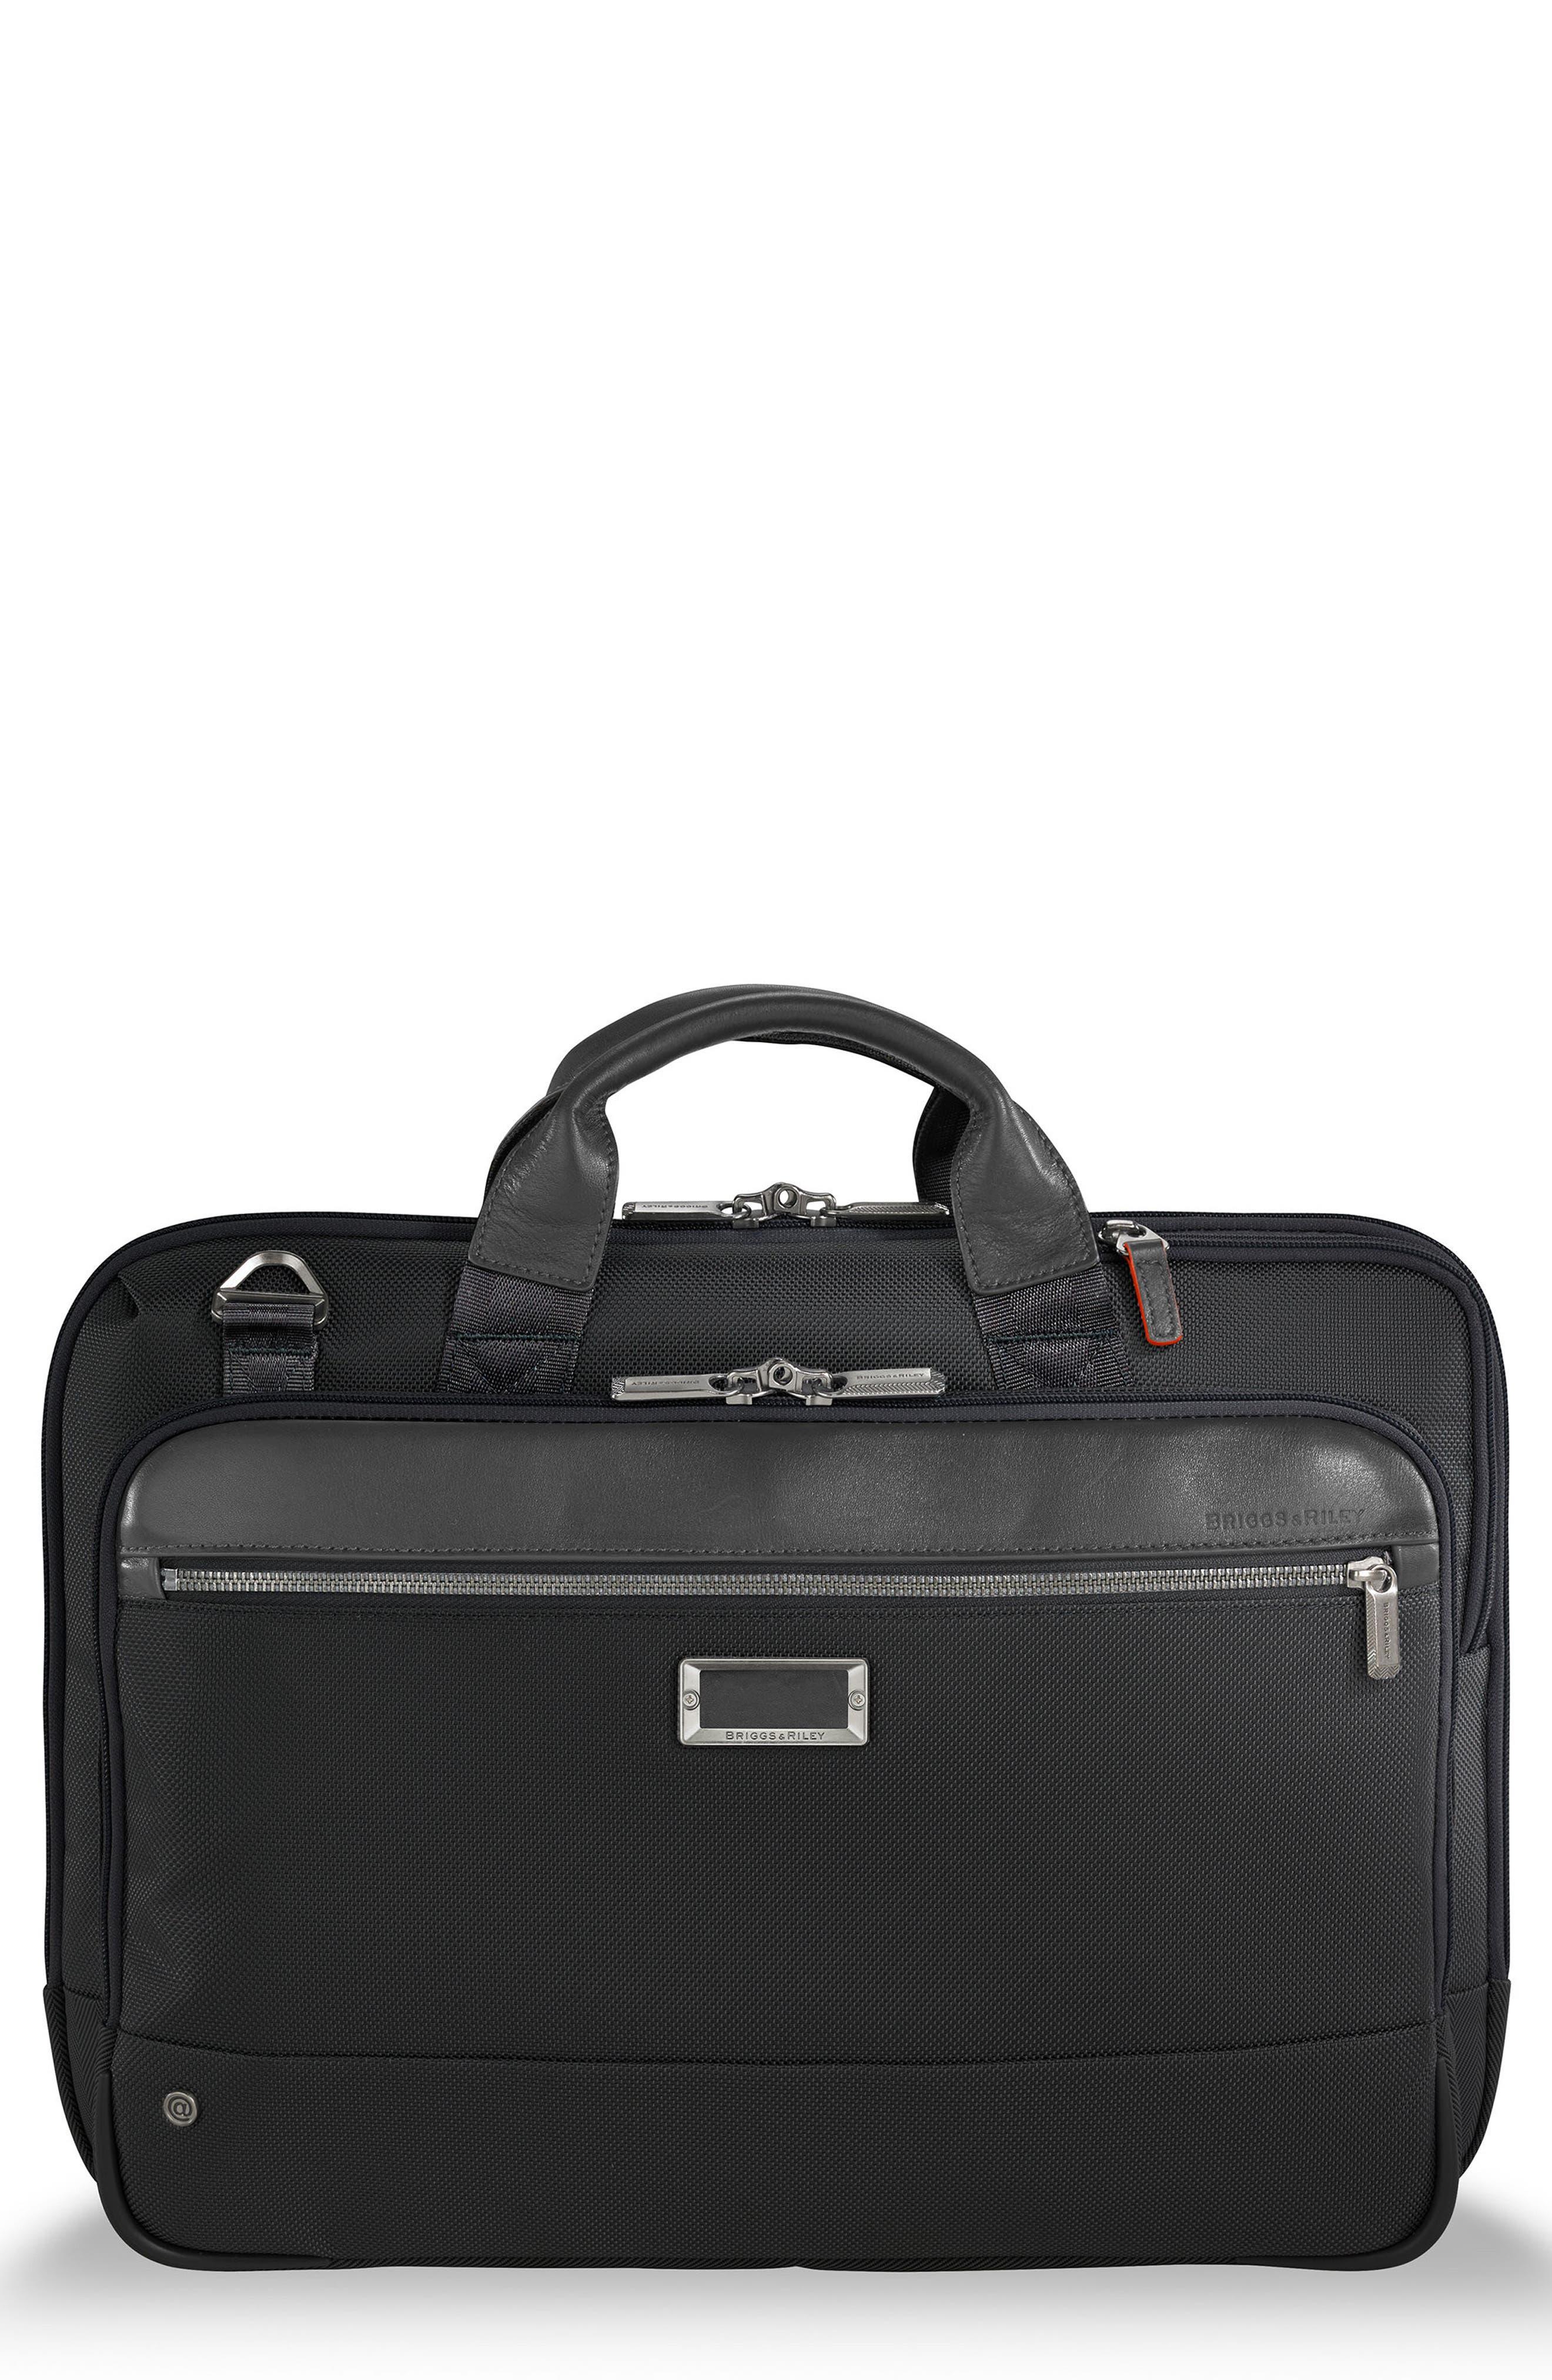 @work Slim Briefcase,                             Main thumbnail 1, color,                             Black